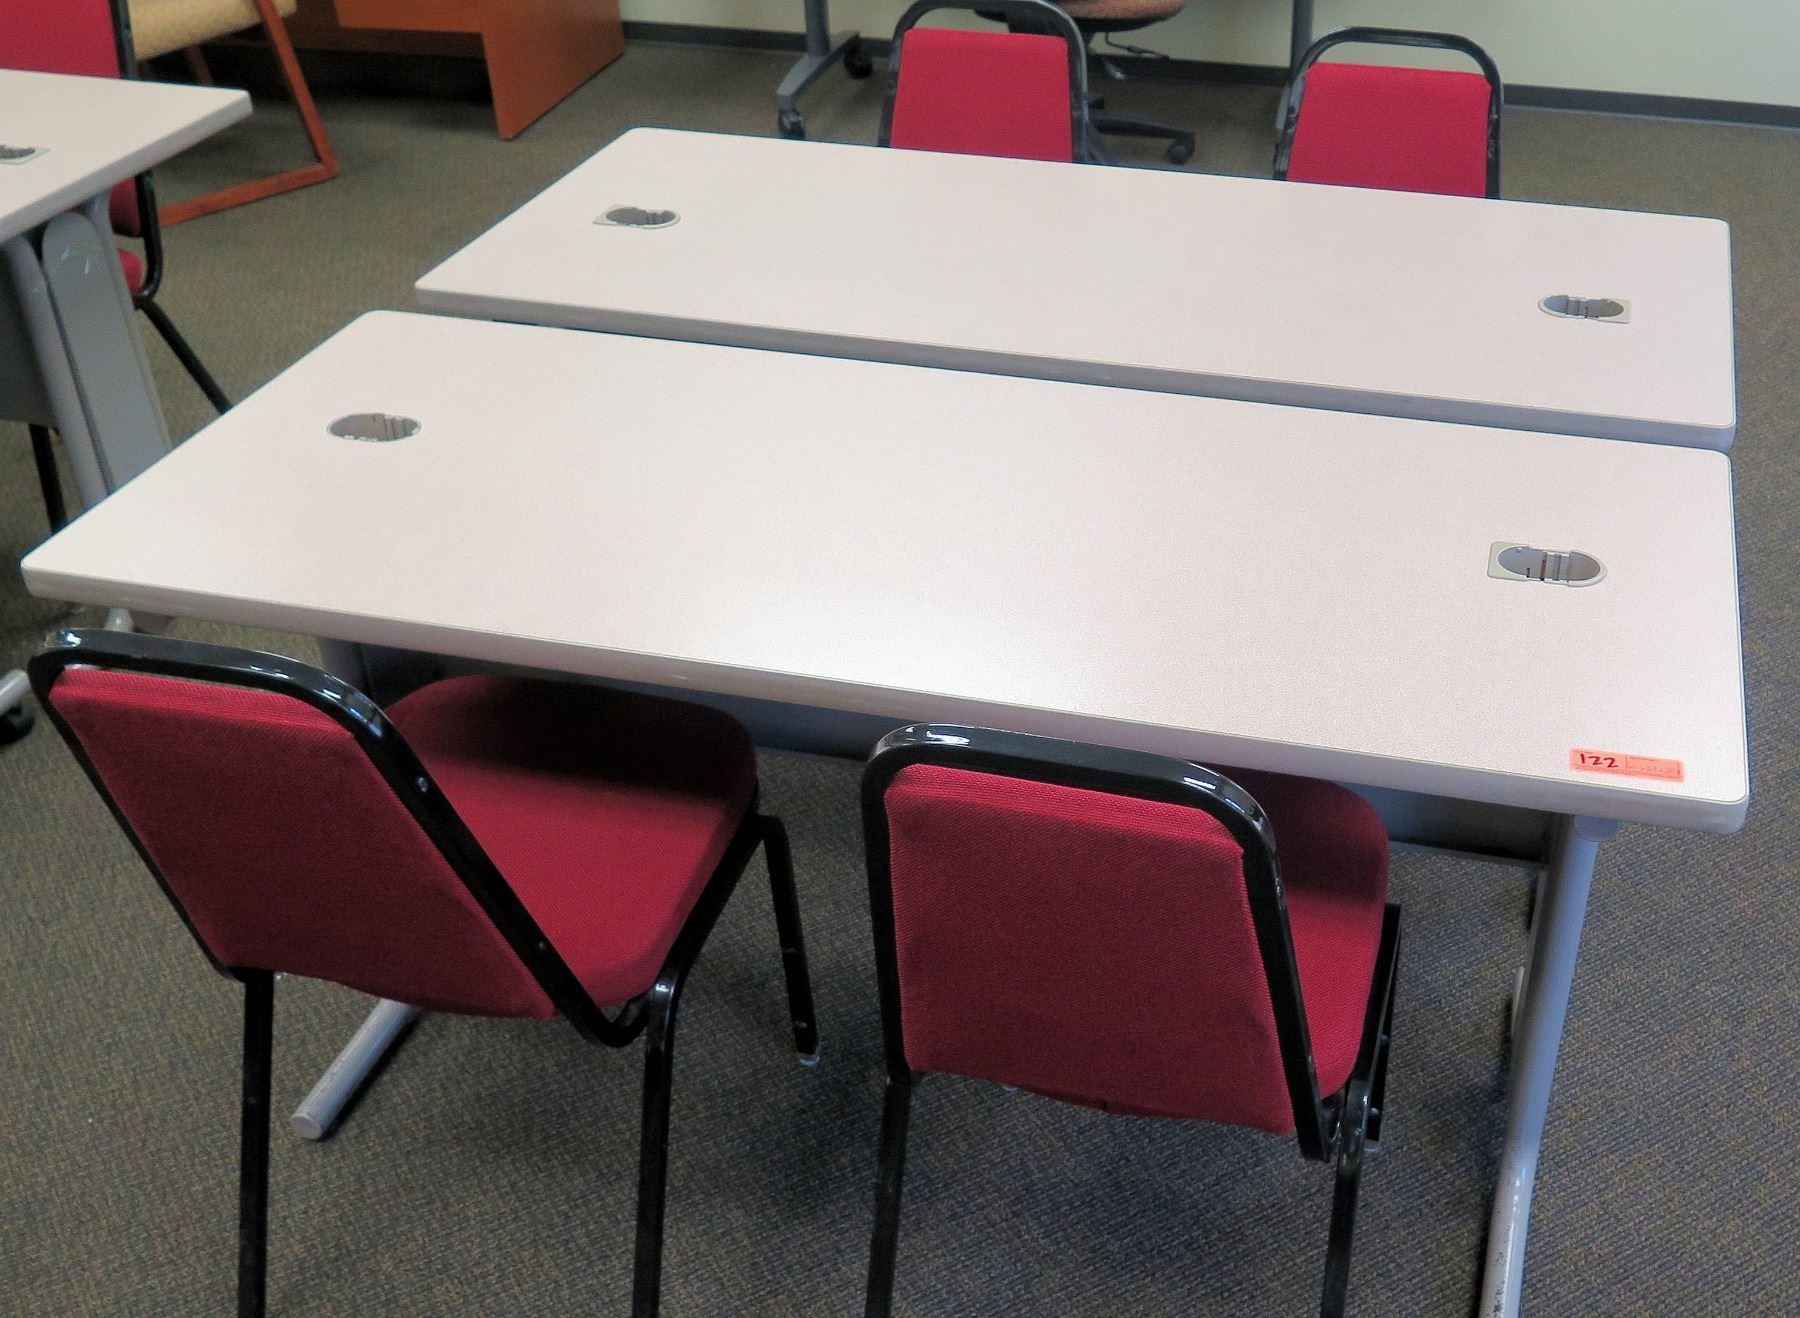 Qty 2 Utility Tables Desks 60 X 24 X 29 H 4 Chairs